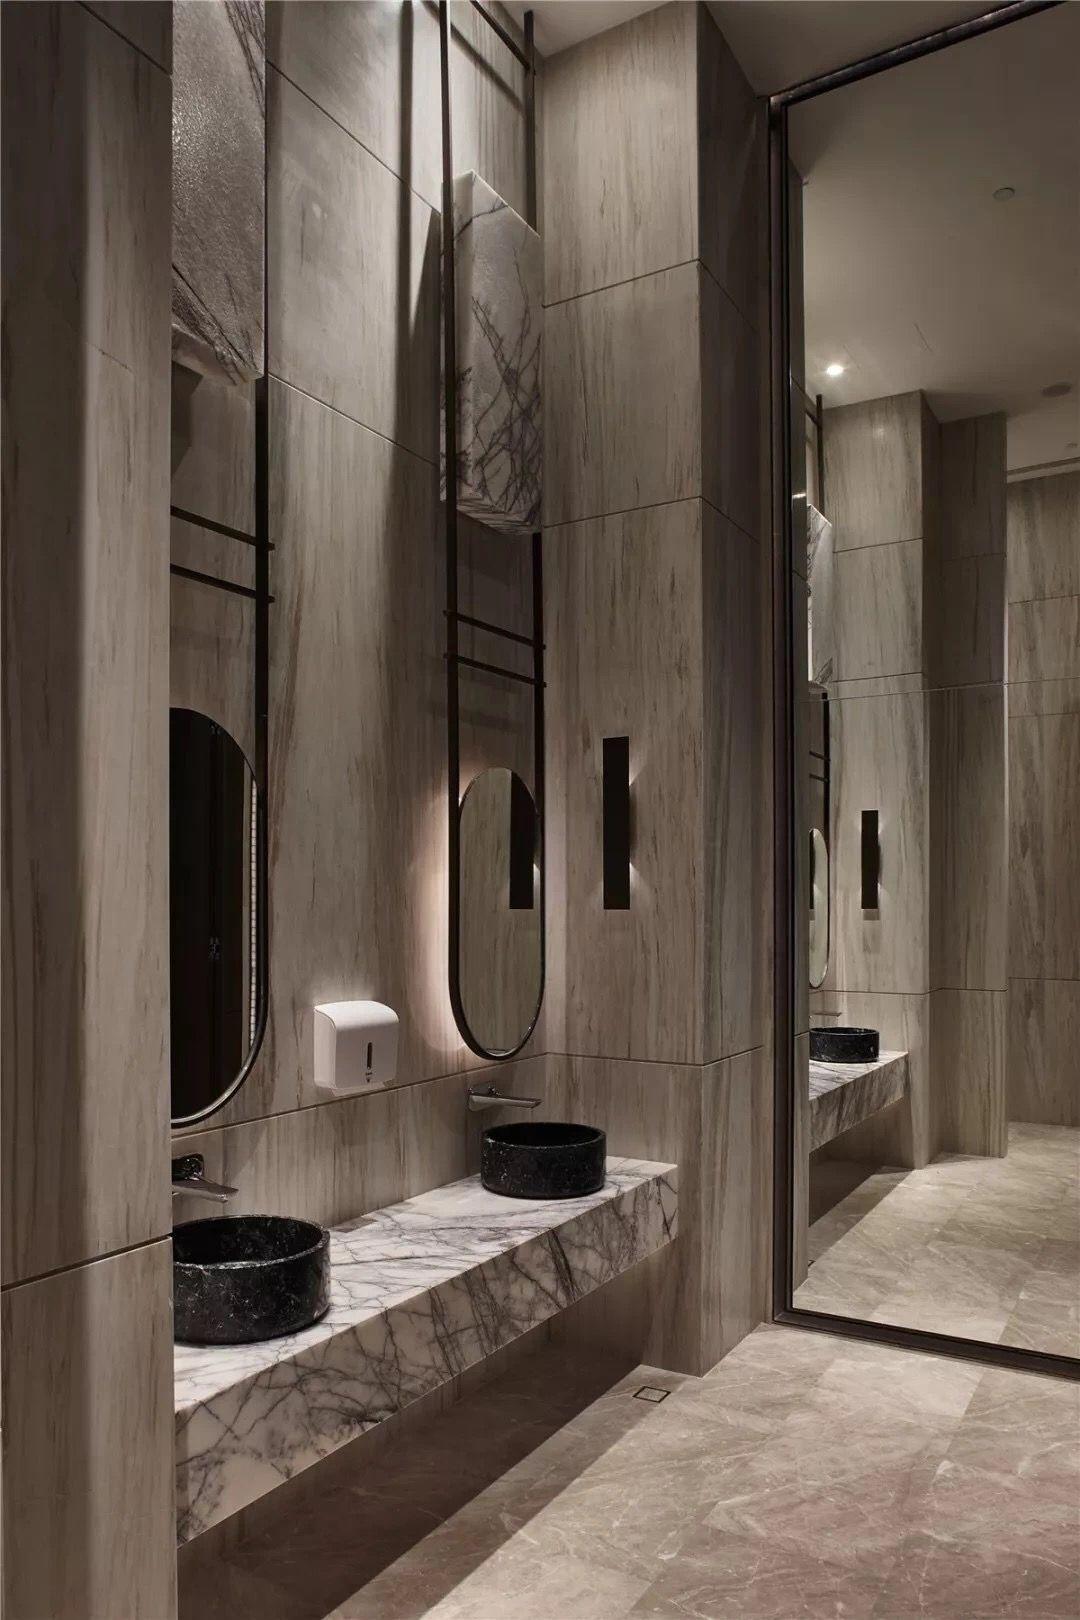 Pin By Corleone On A售樓処 Bathroom Interior Design Washroom Design Restroom Design